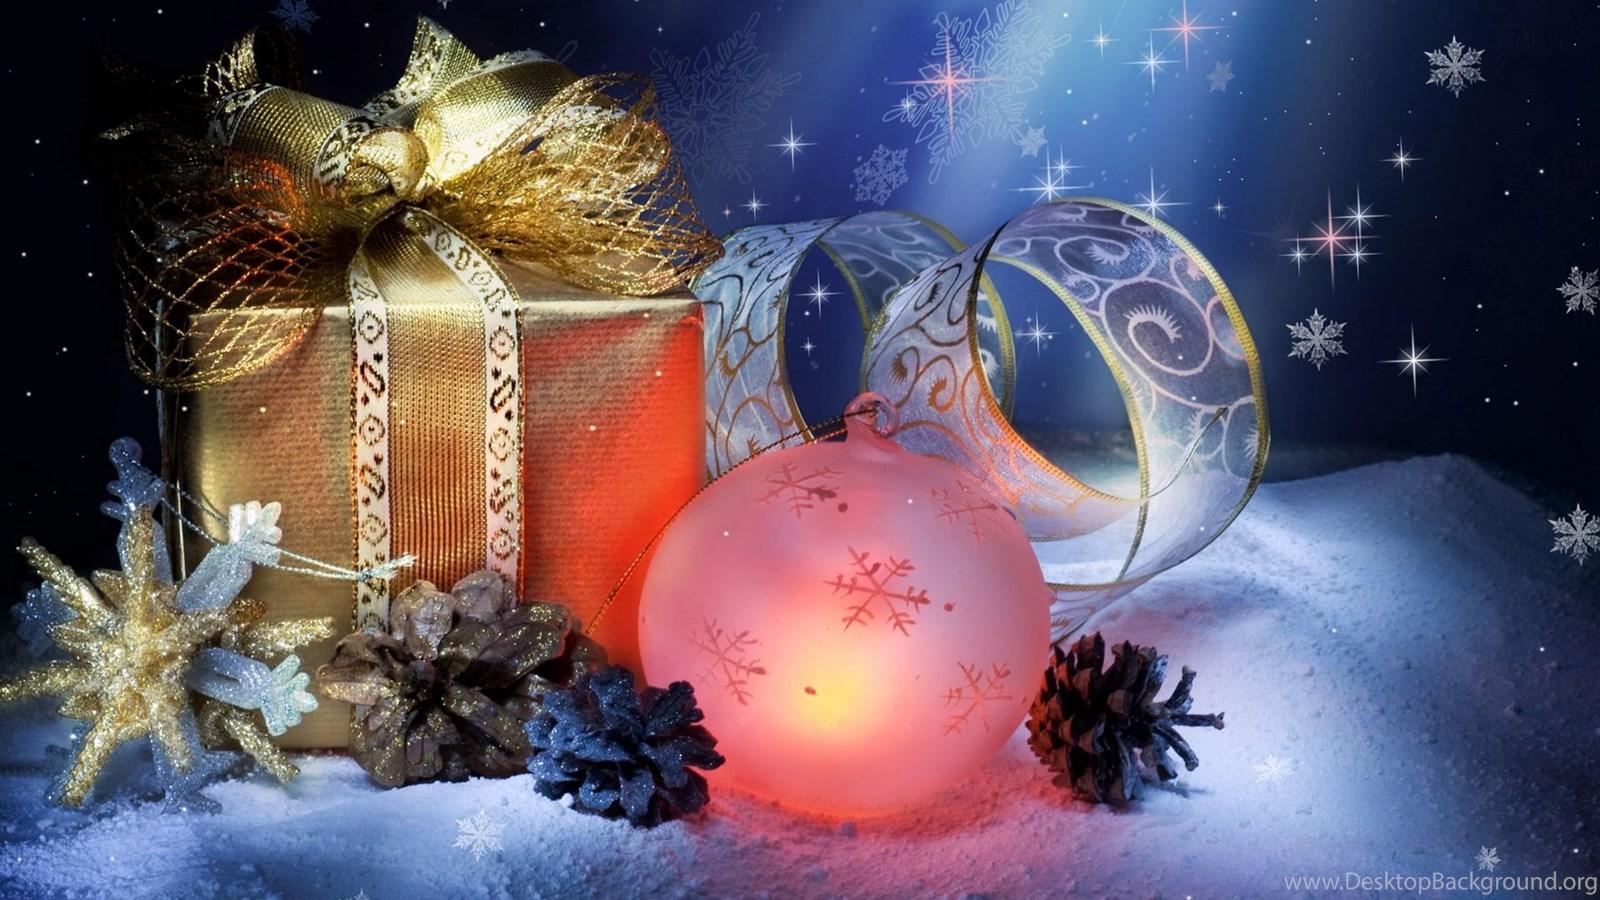 Free Wallpapers Christmas Ornement Fond Ecran Noel Desktop Background